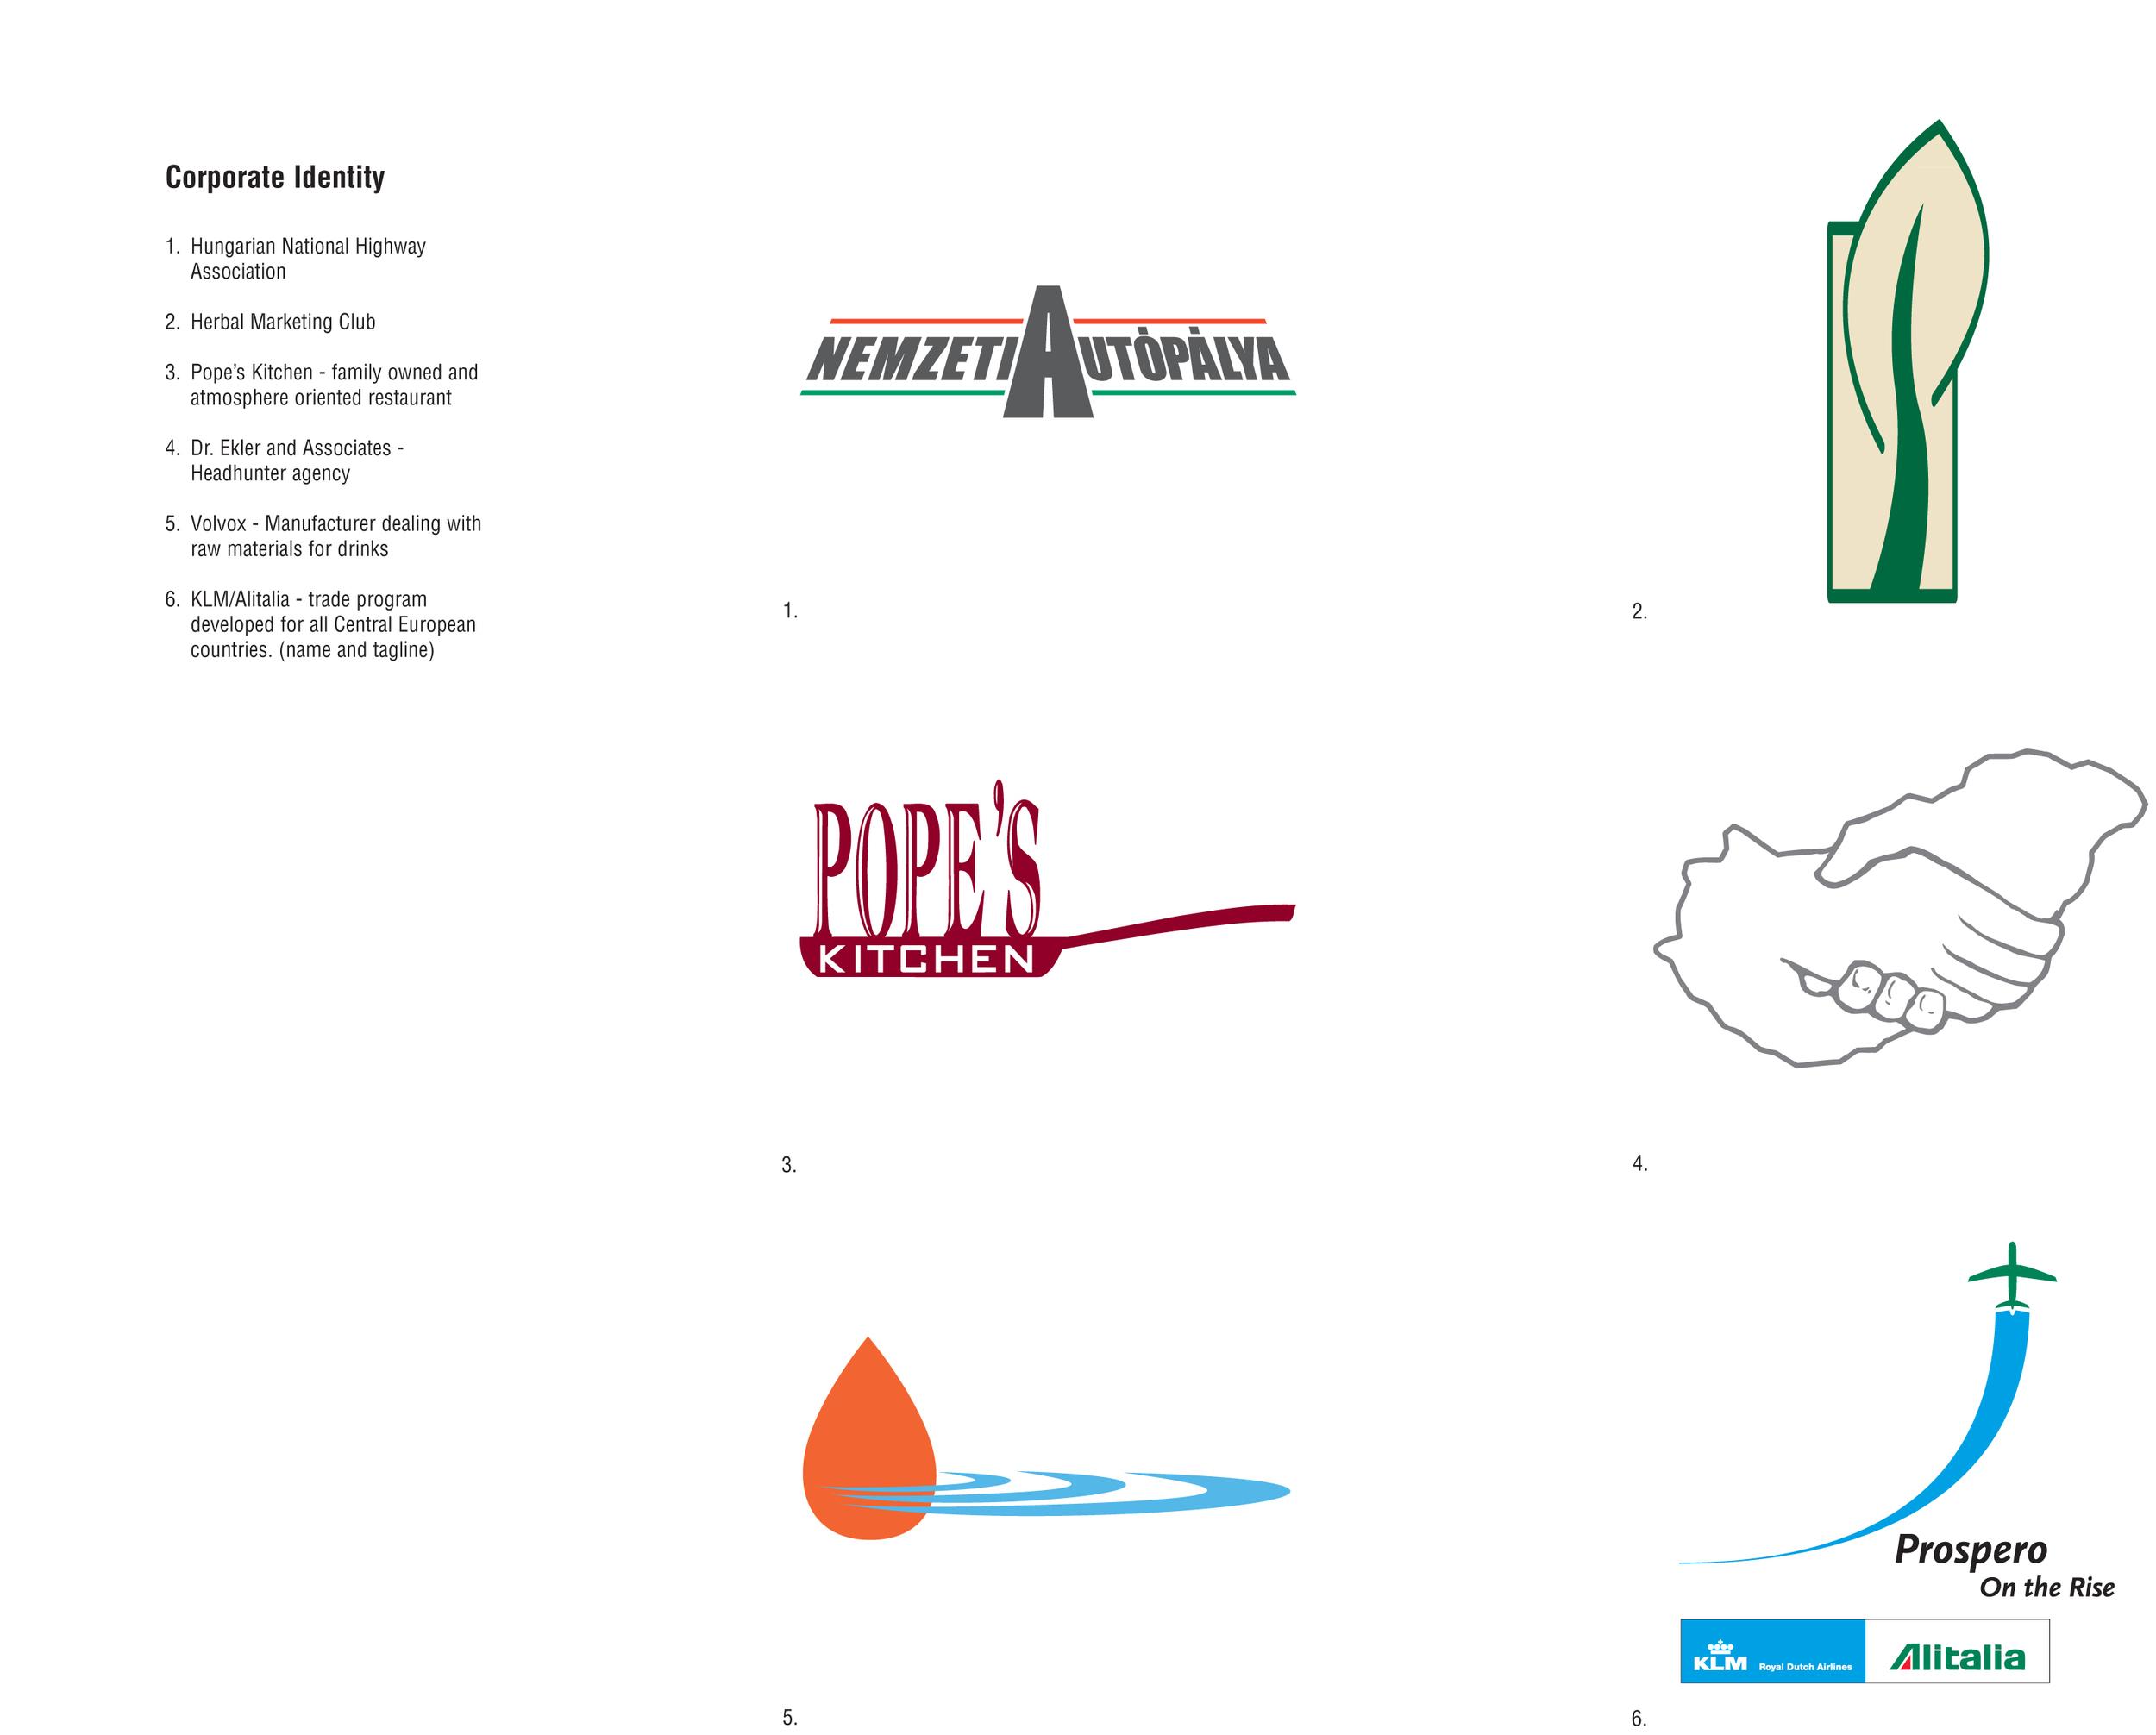 PORTFOLIO_logos.jpg